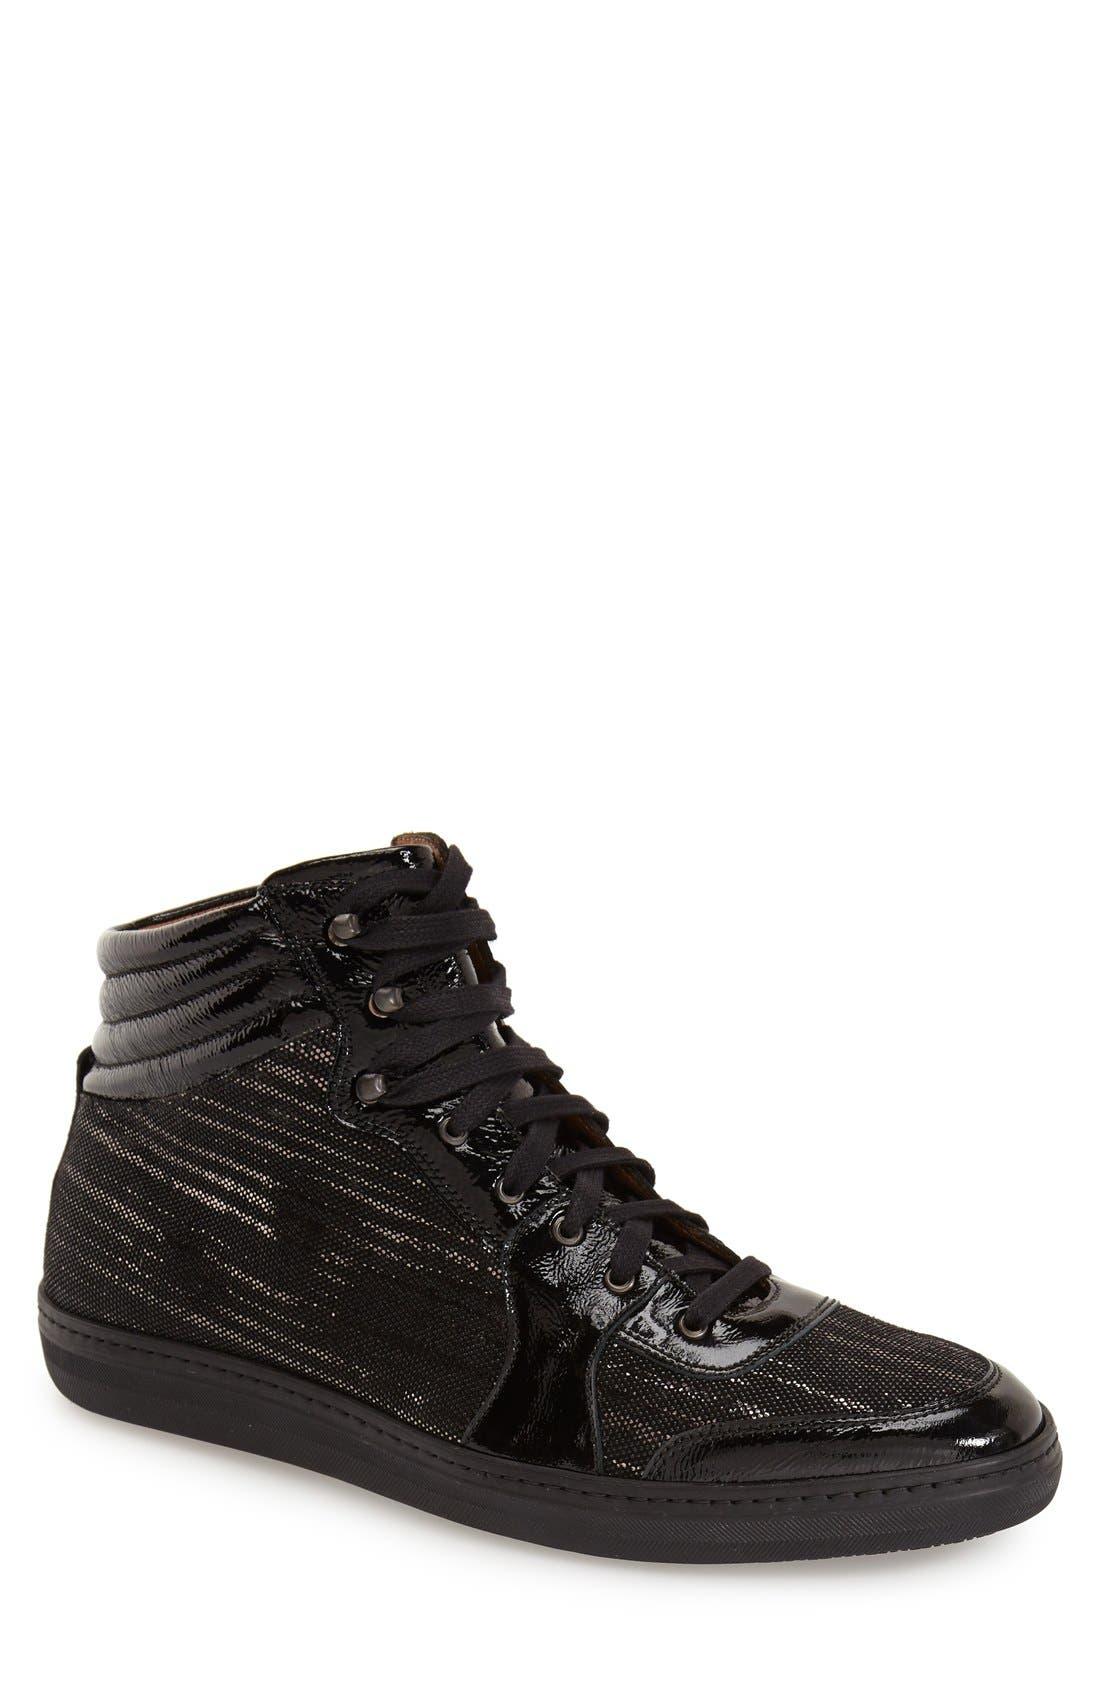 'Bordeau' Sneaker,                             Main thumbnail 1, color,                             Black